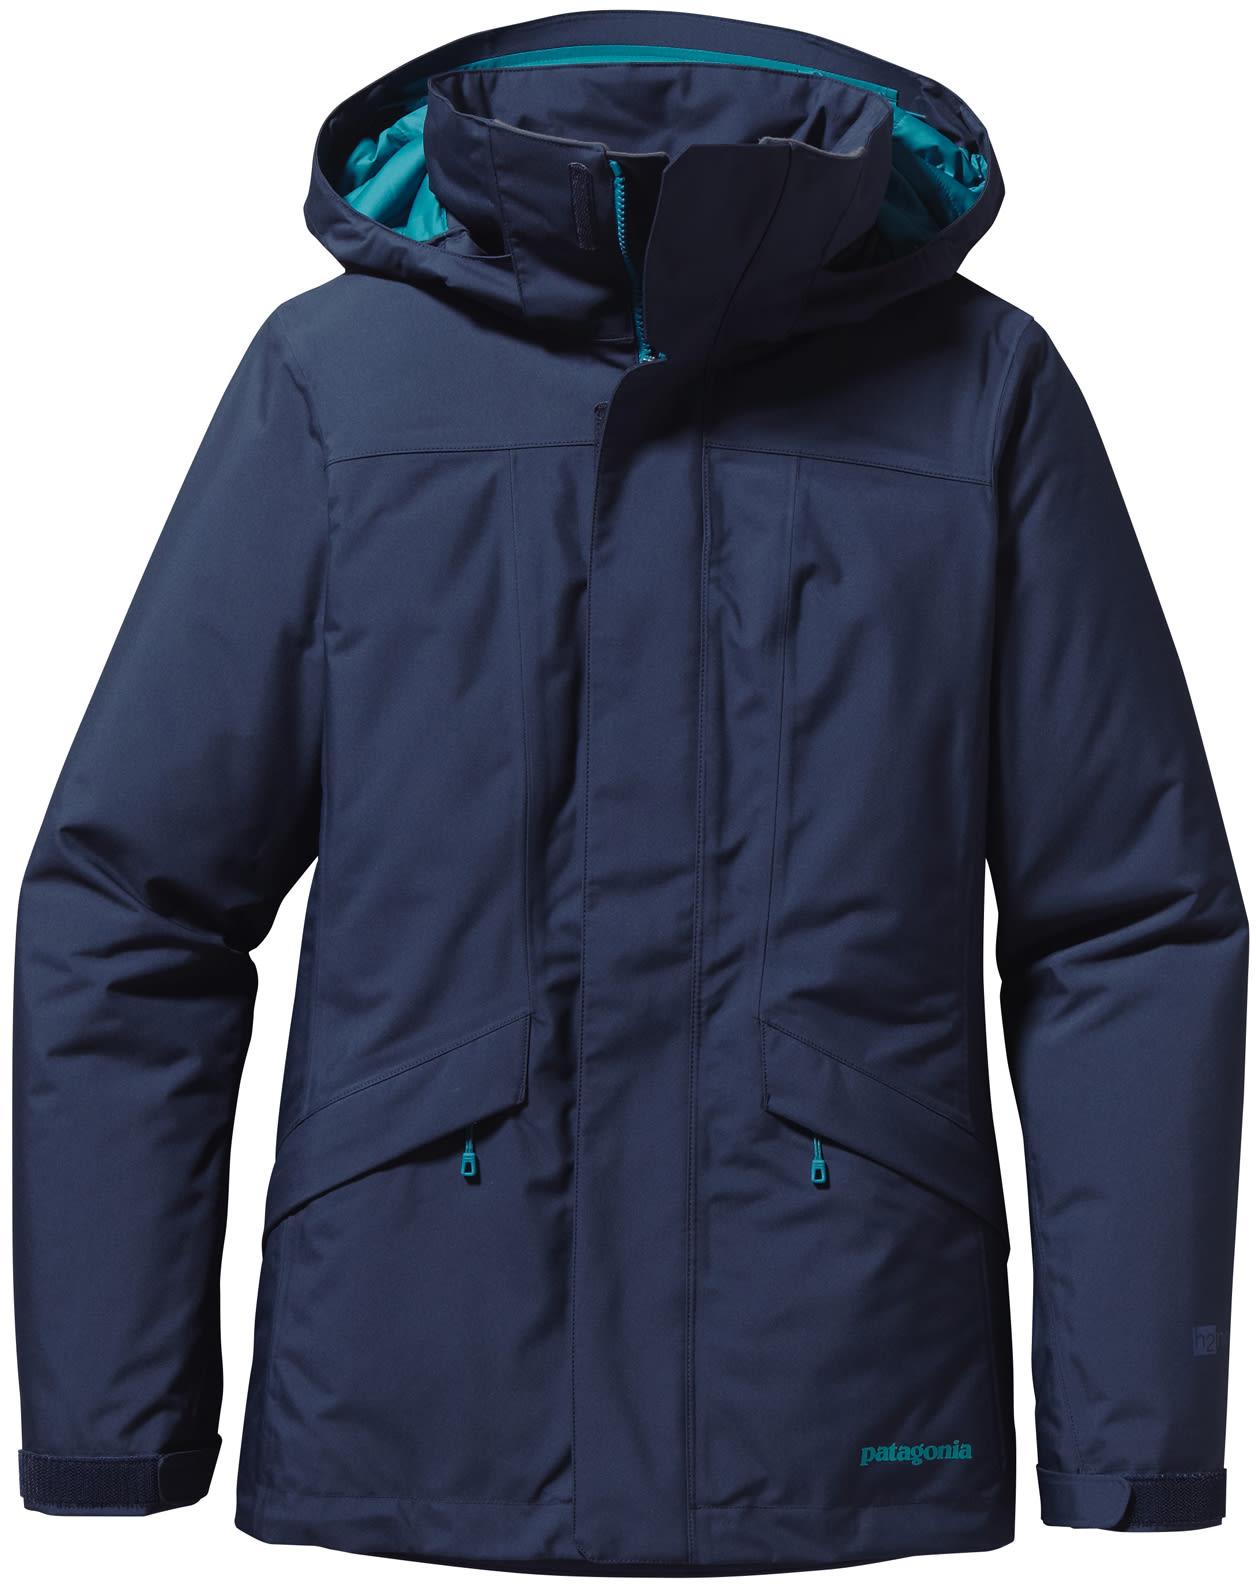 Patagonia womens ski jackets